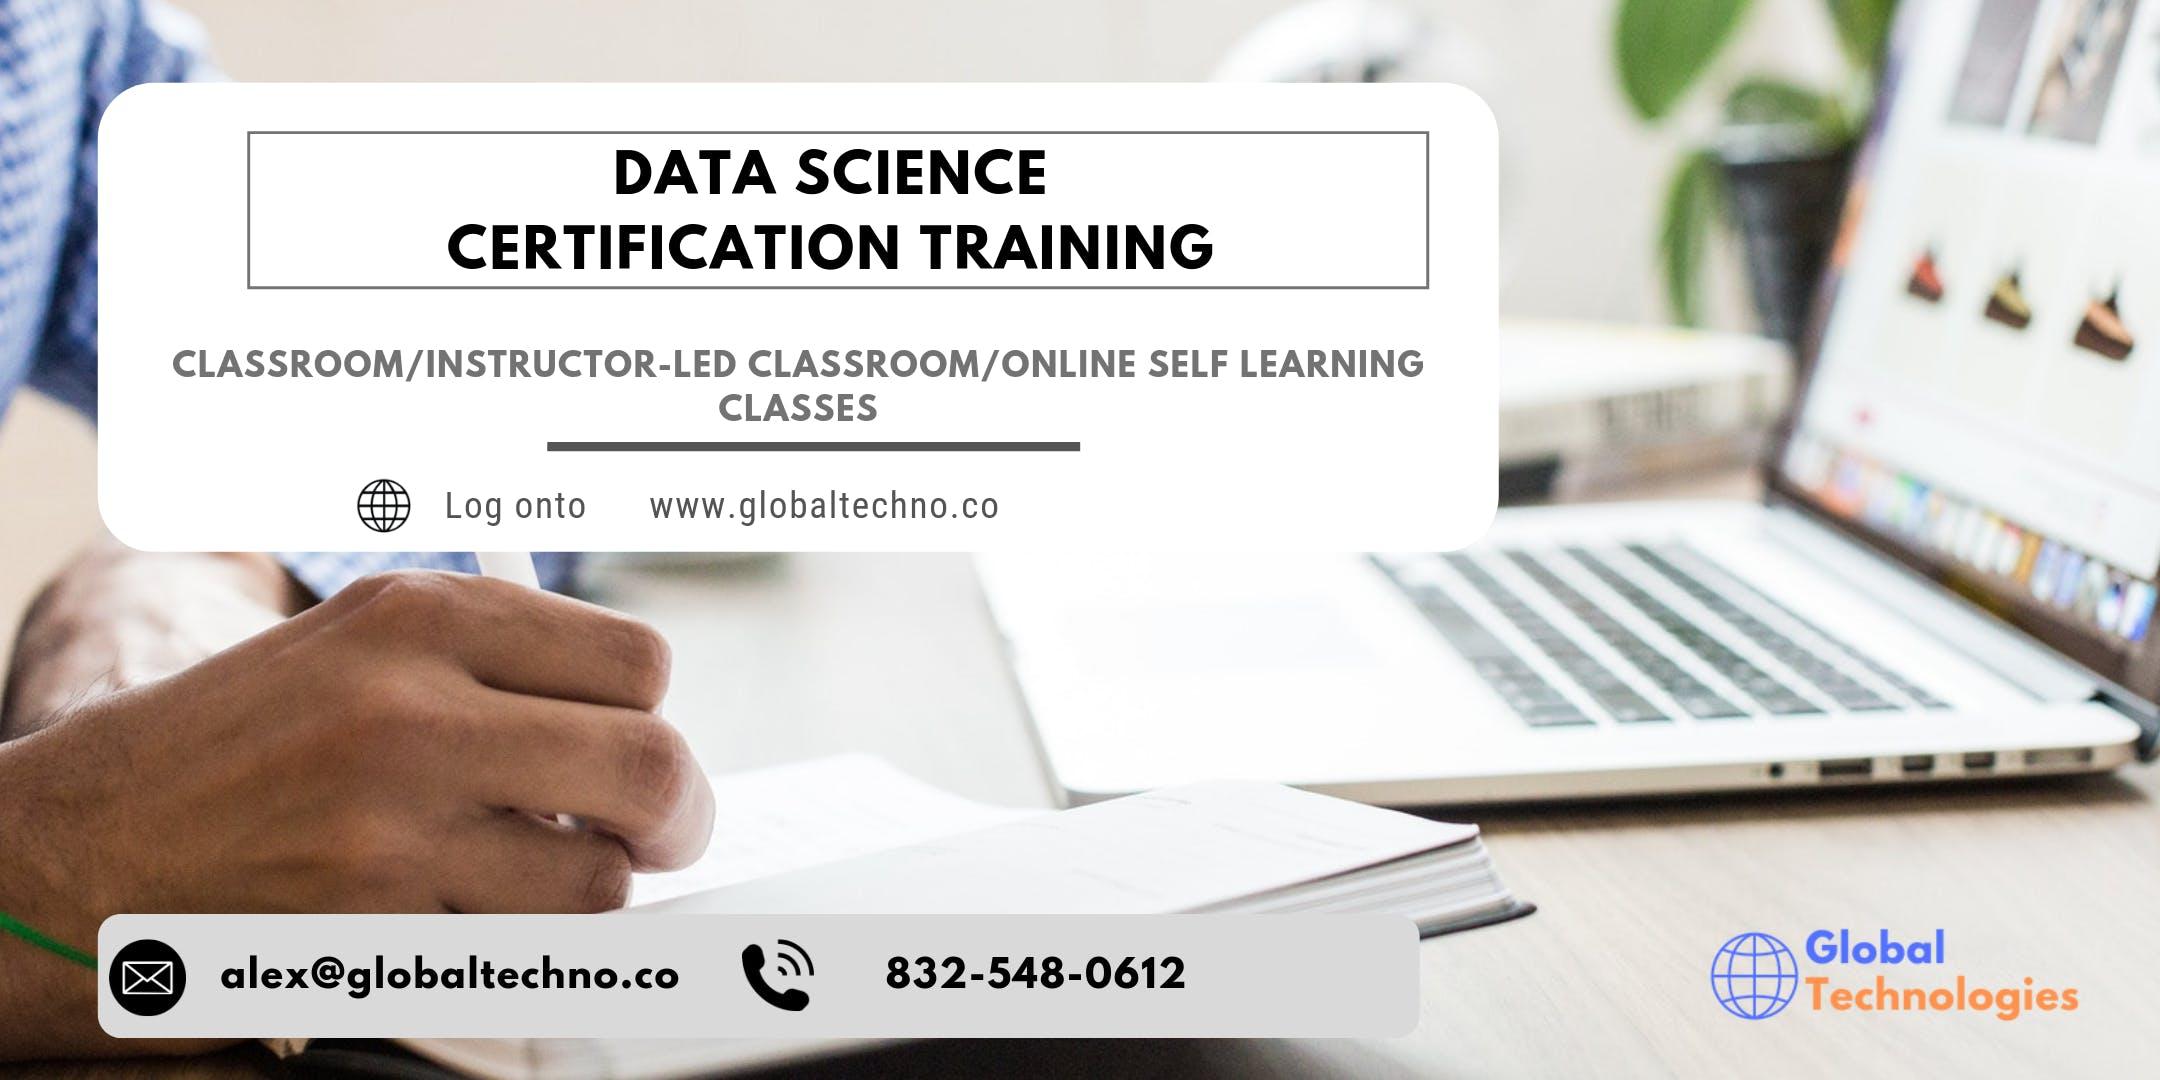 Data Science Classroom Training in Kelowna, BC